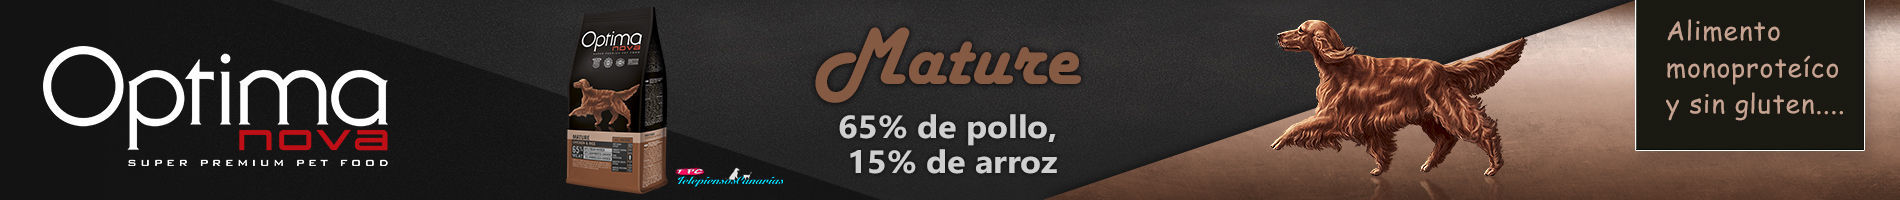 Optima nova mature, con 65% pollo y 15% arroz